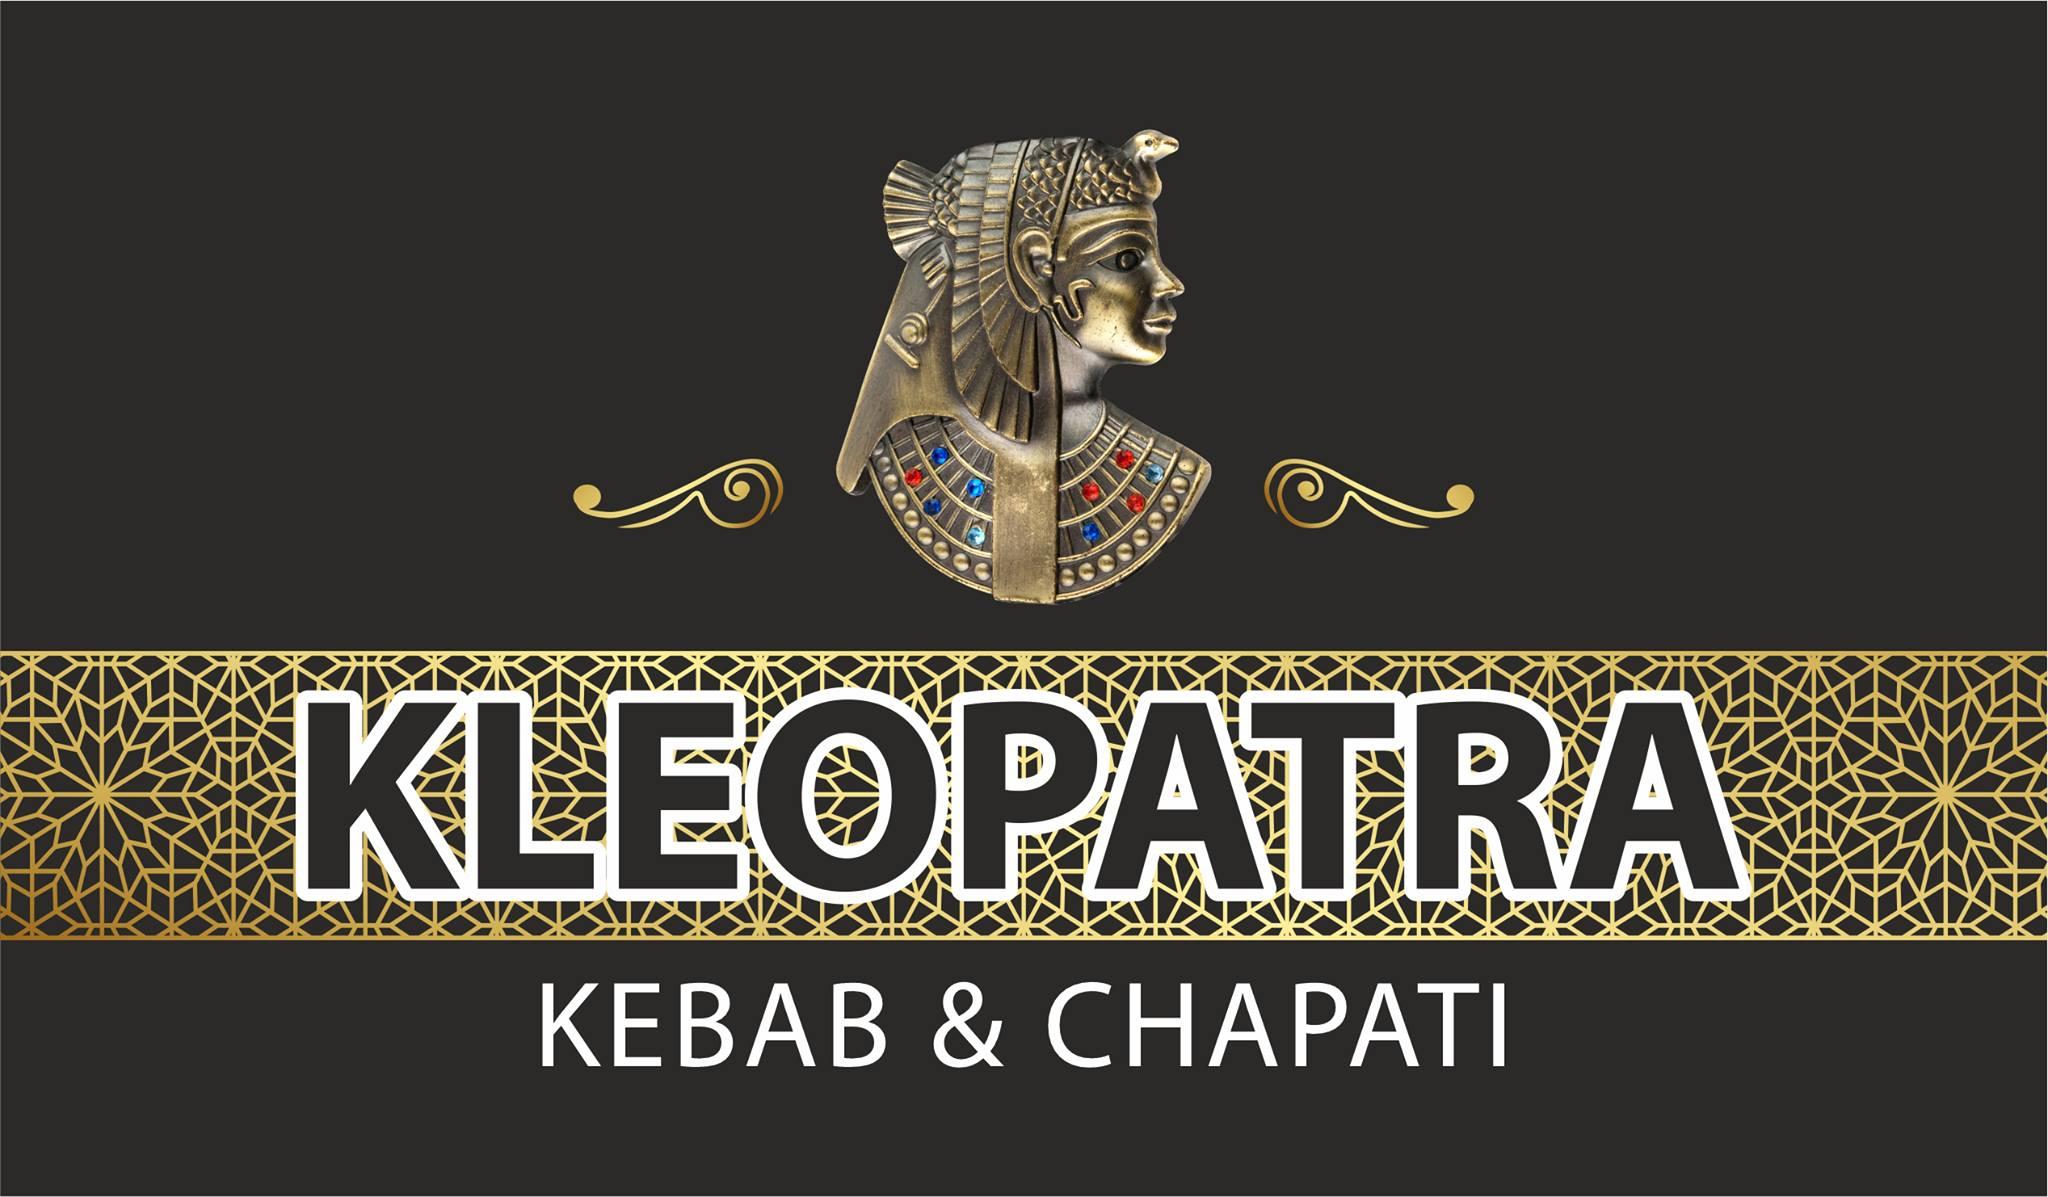 Kleopatra - Kebab & Chapati